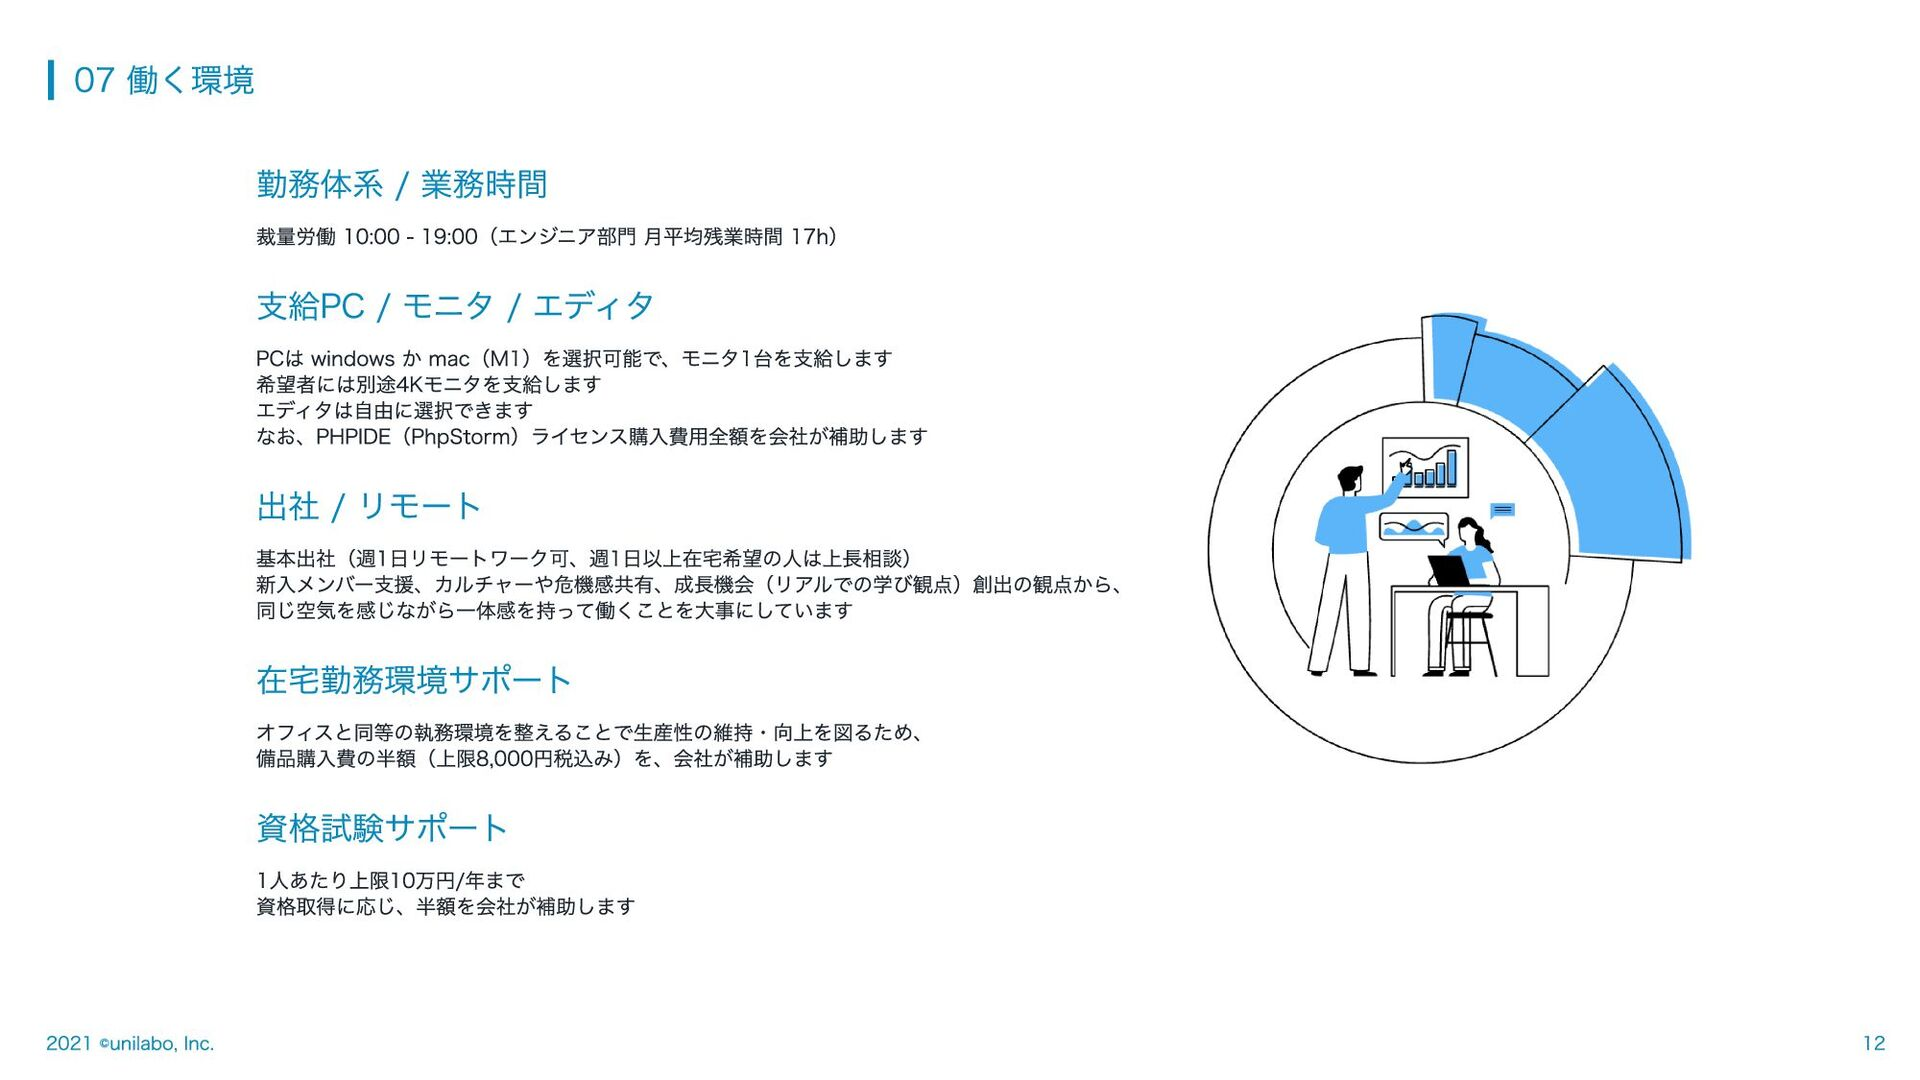 勤務体系 / 業務時間  裁量労働 / 10:00 - 19:00(エンジニア部門 月平均...